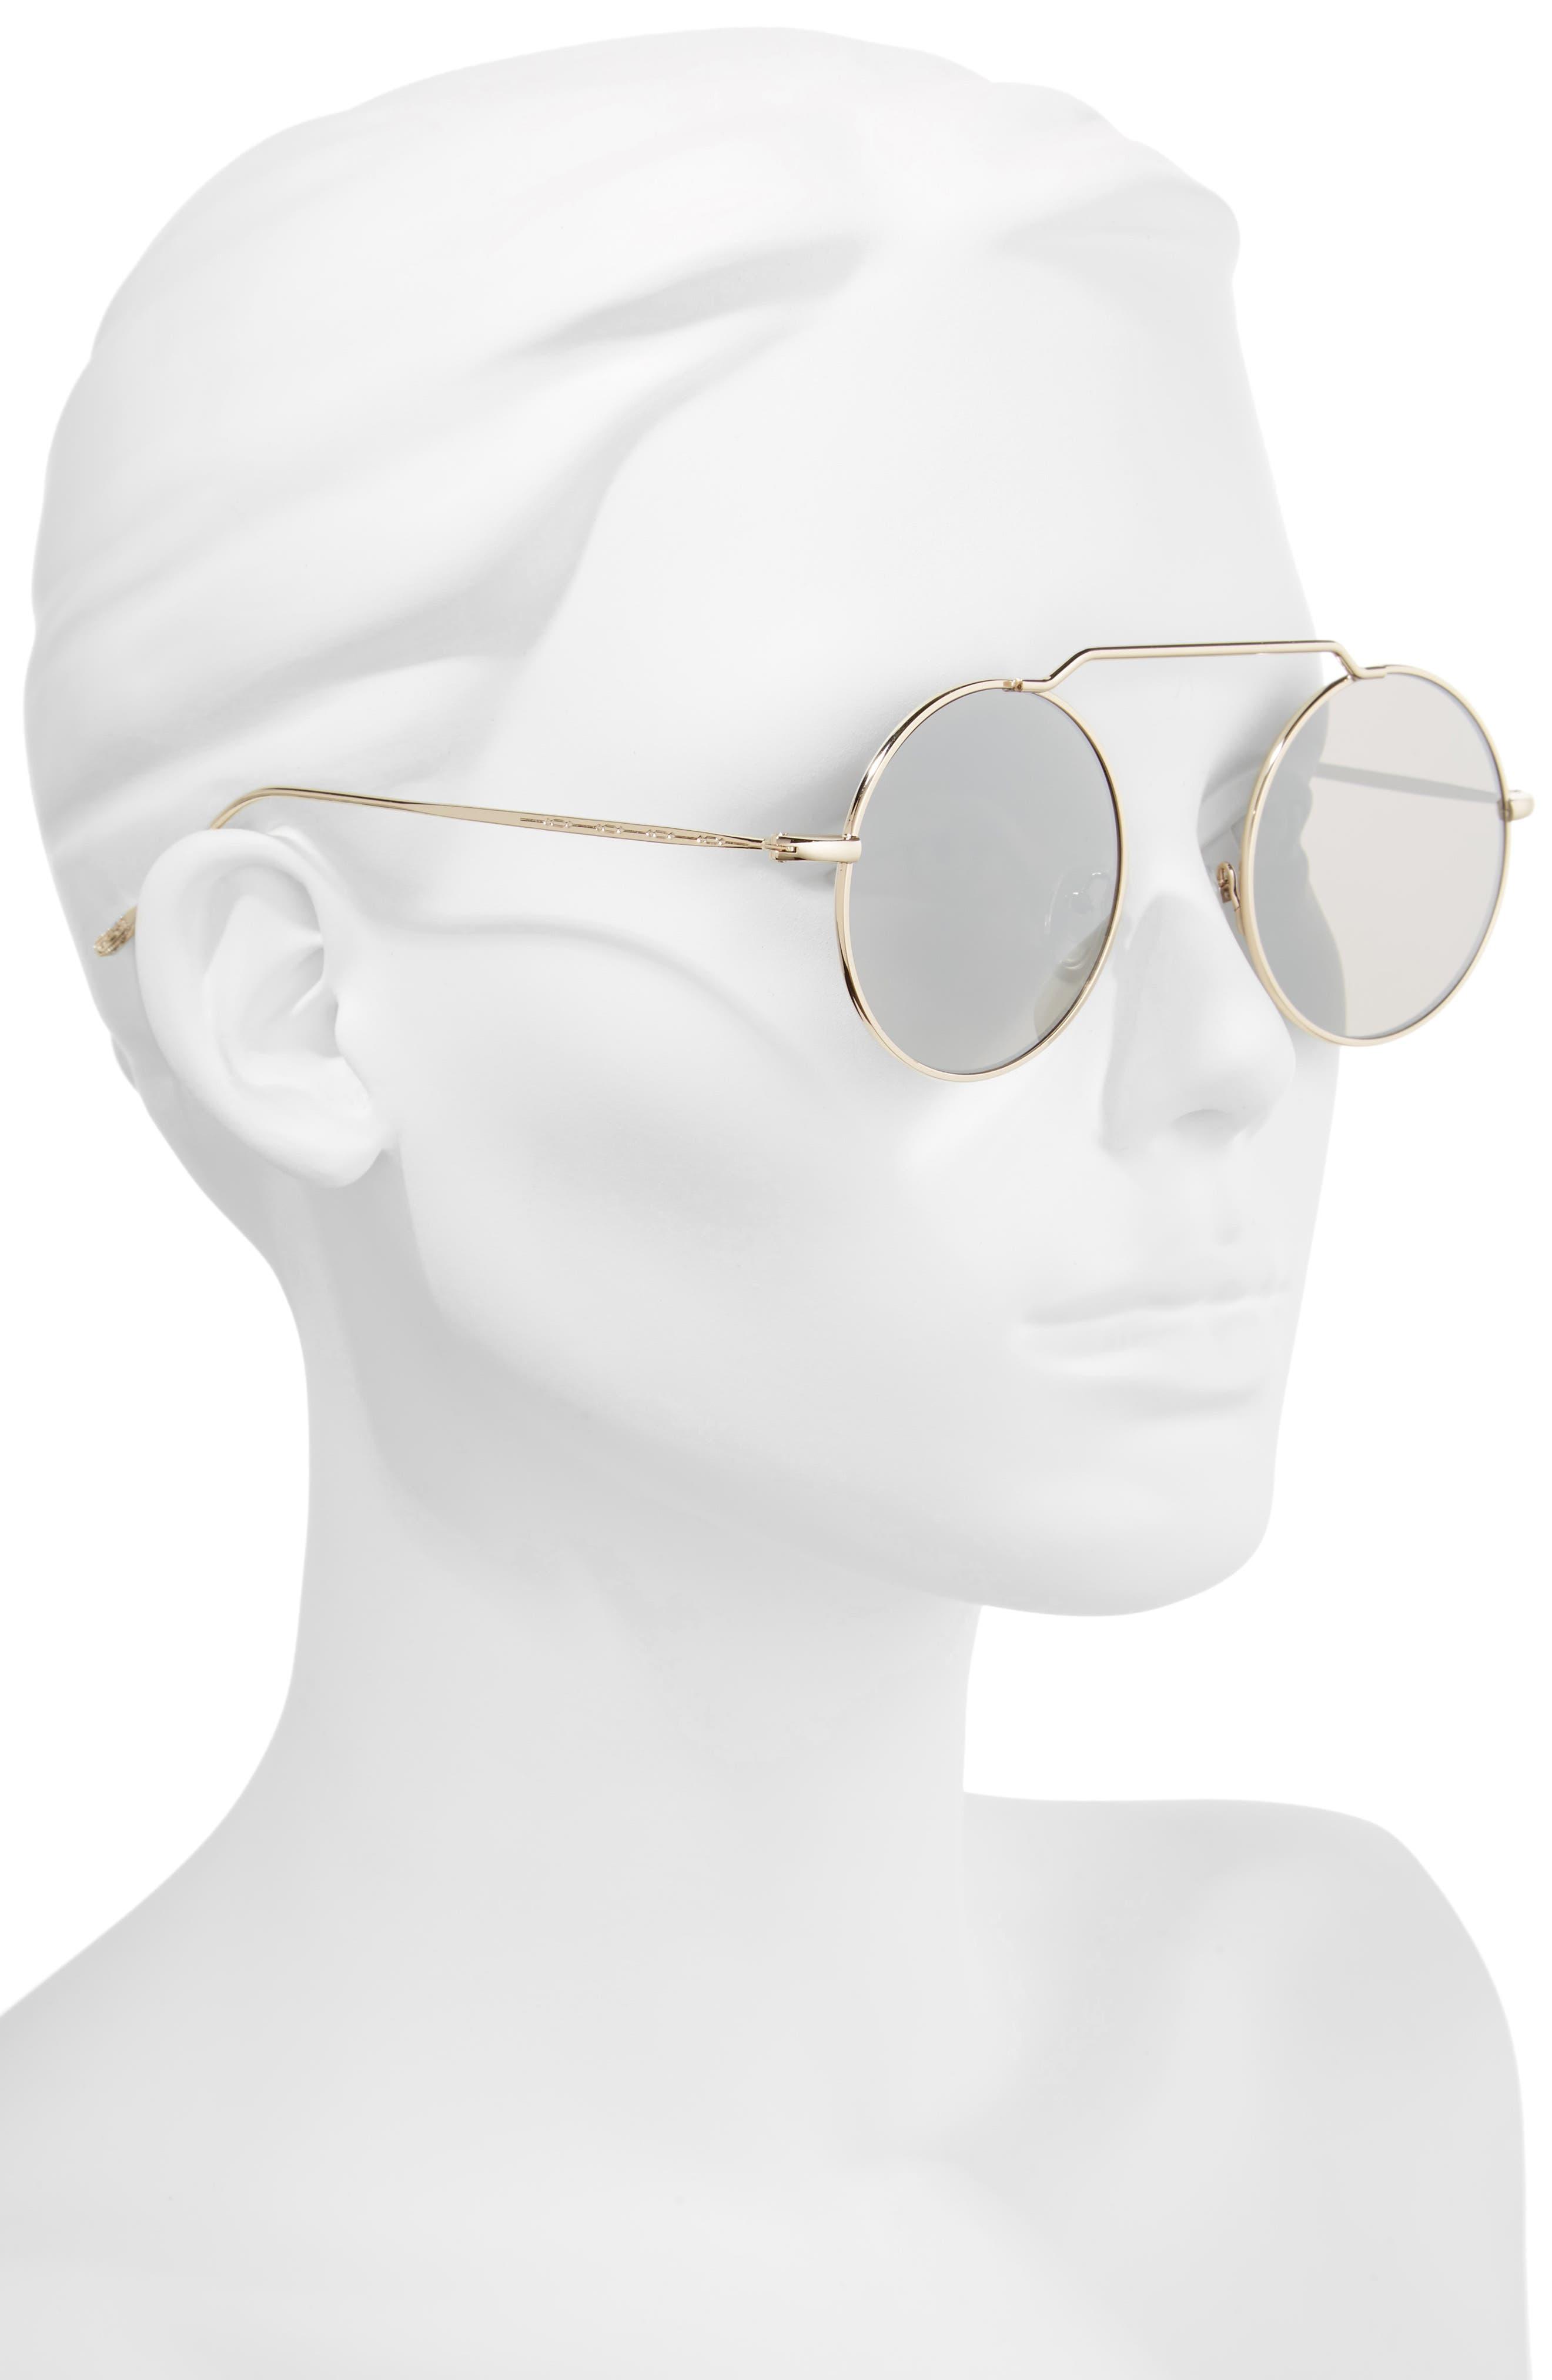 51mm Brow Bar Round Sunglasses,                             Alternate thumbnail 5, color,